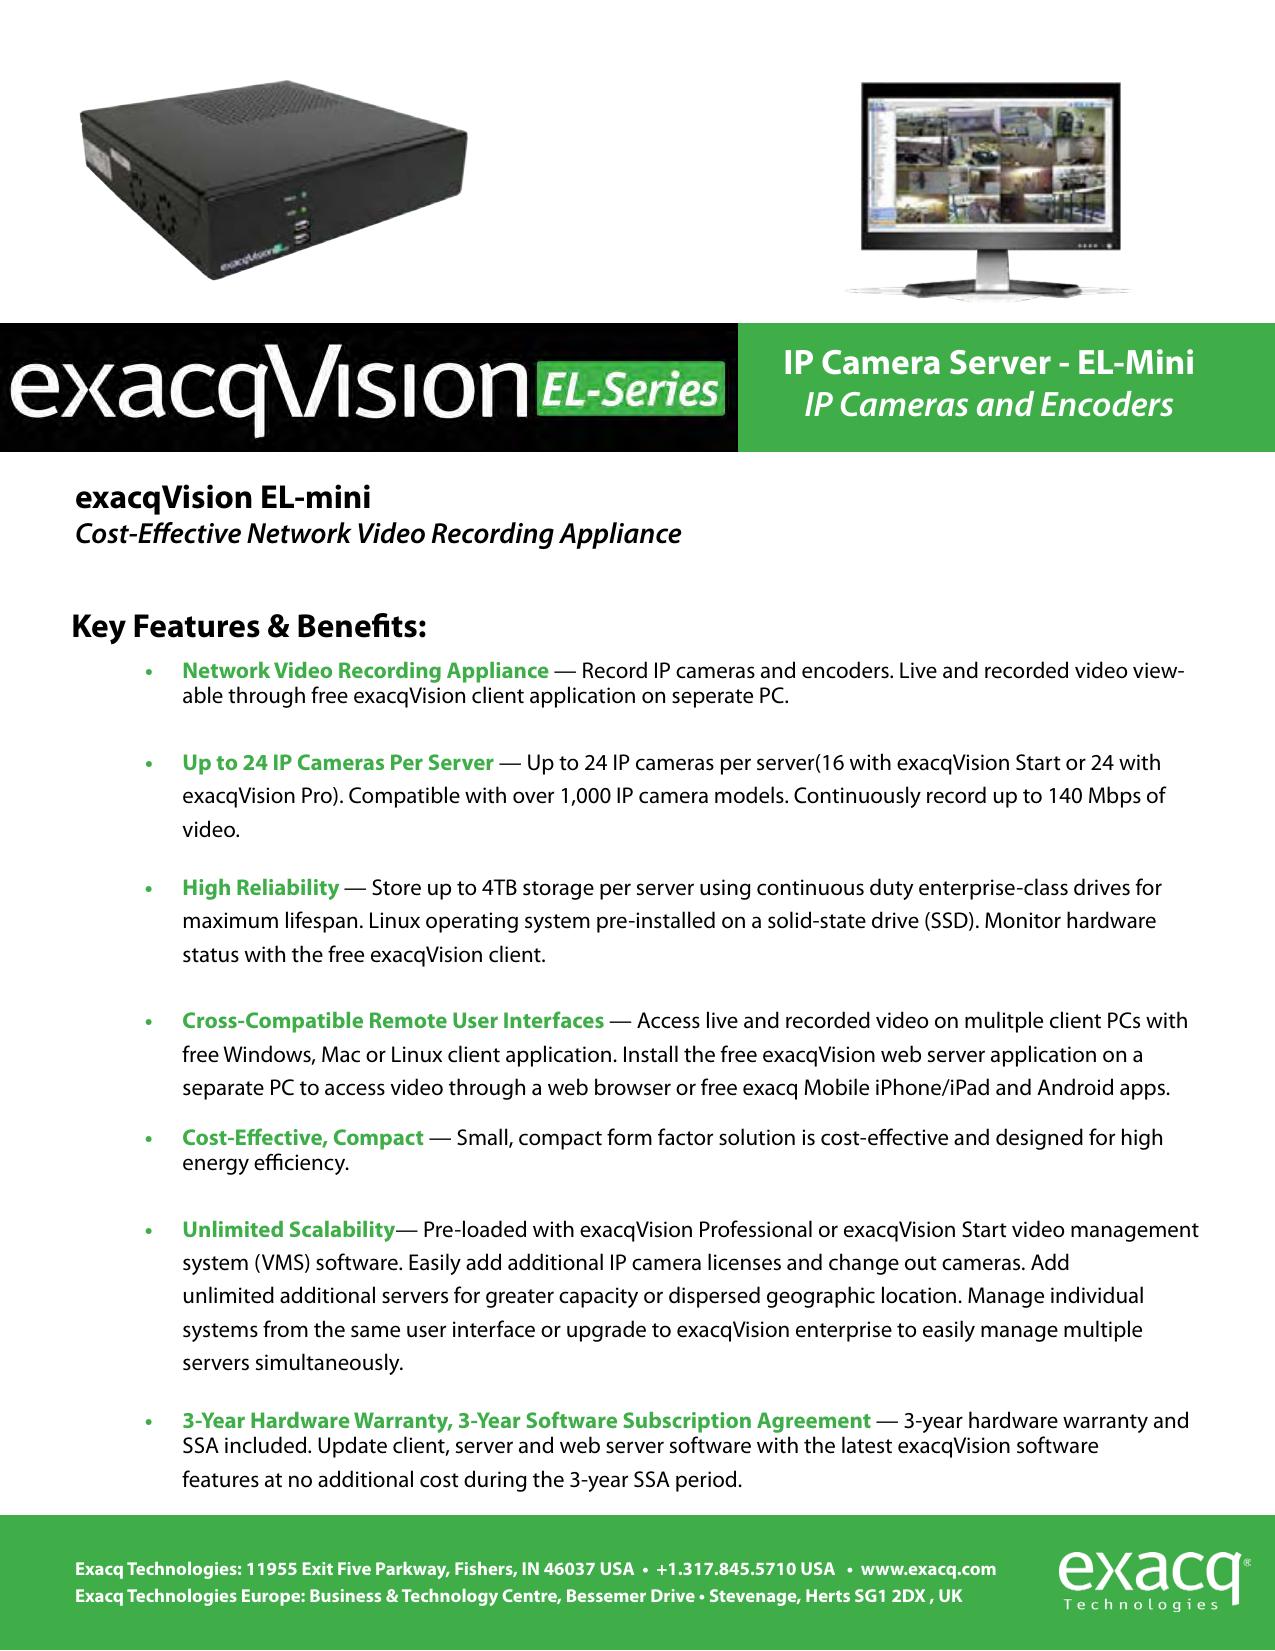 IP Camera Server - EL-Mini IP Cameras and Encoders